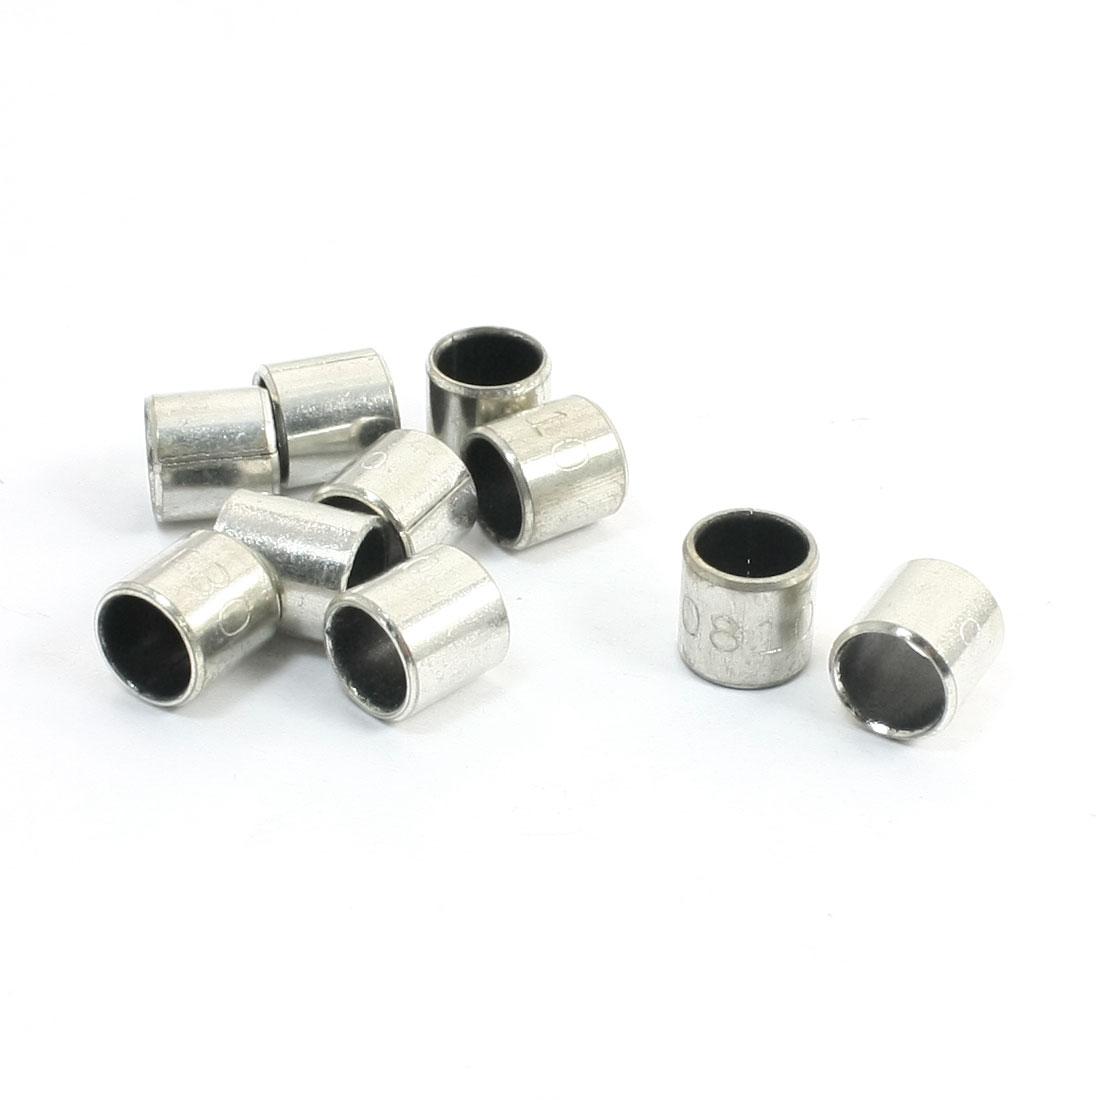 10 Pcs Self-lubricating Composite Bearing Bushing Sleeve 8mm x 10mm x 10mm